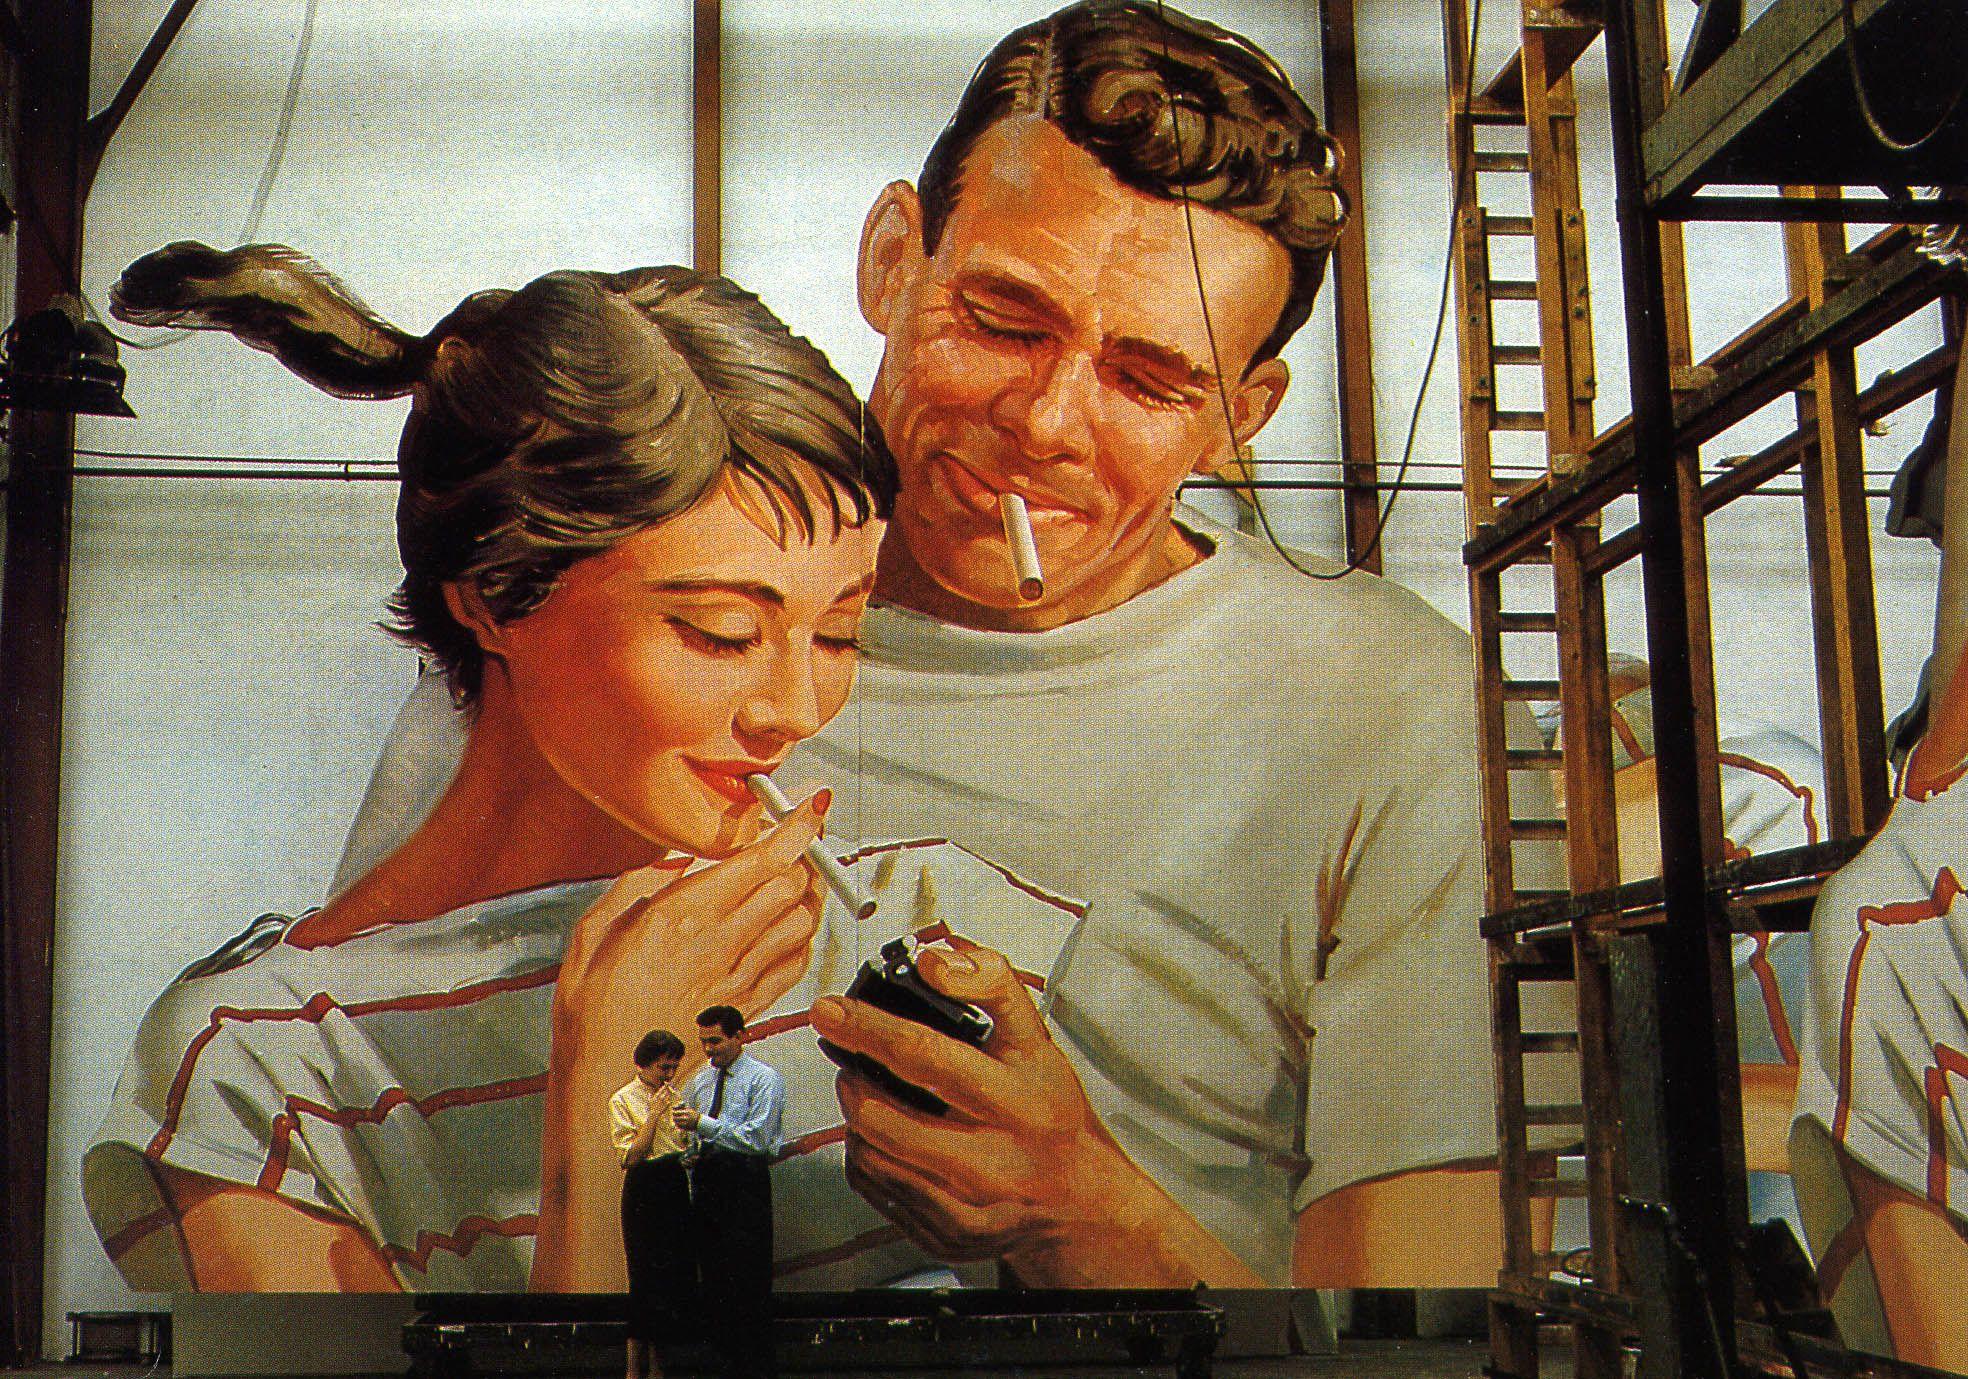 1950s billboard